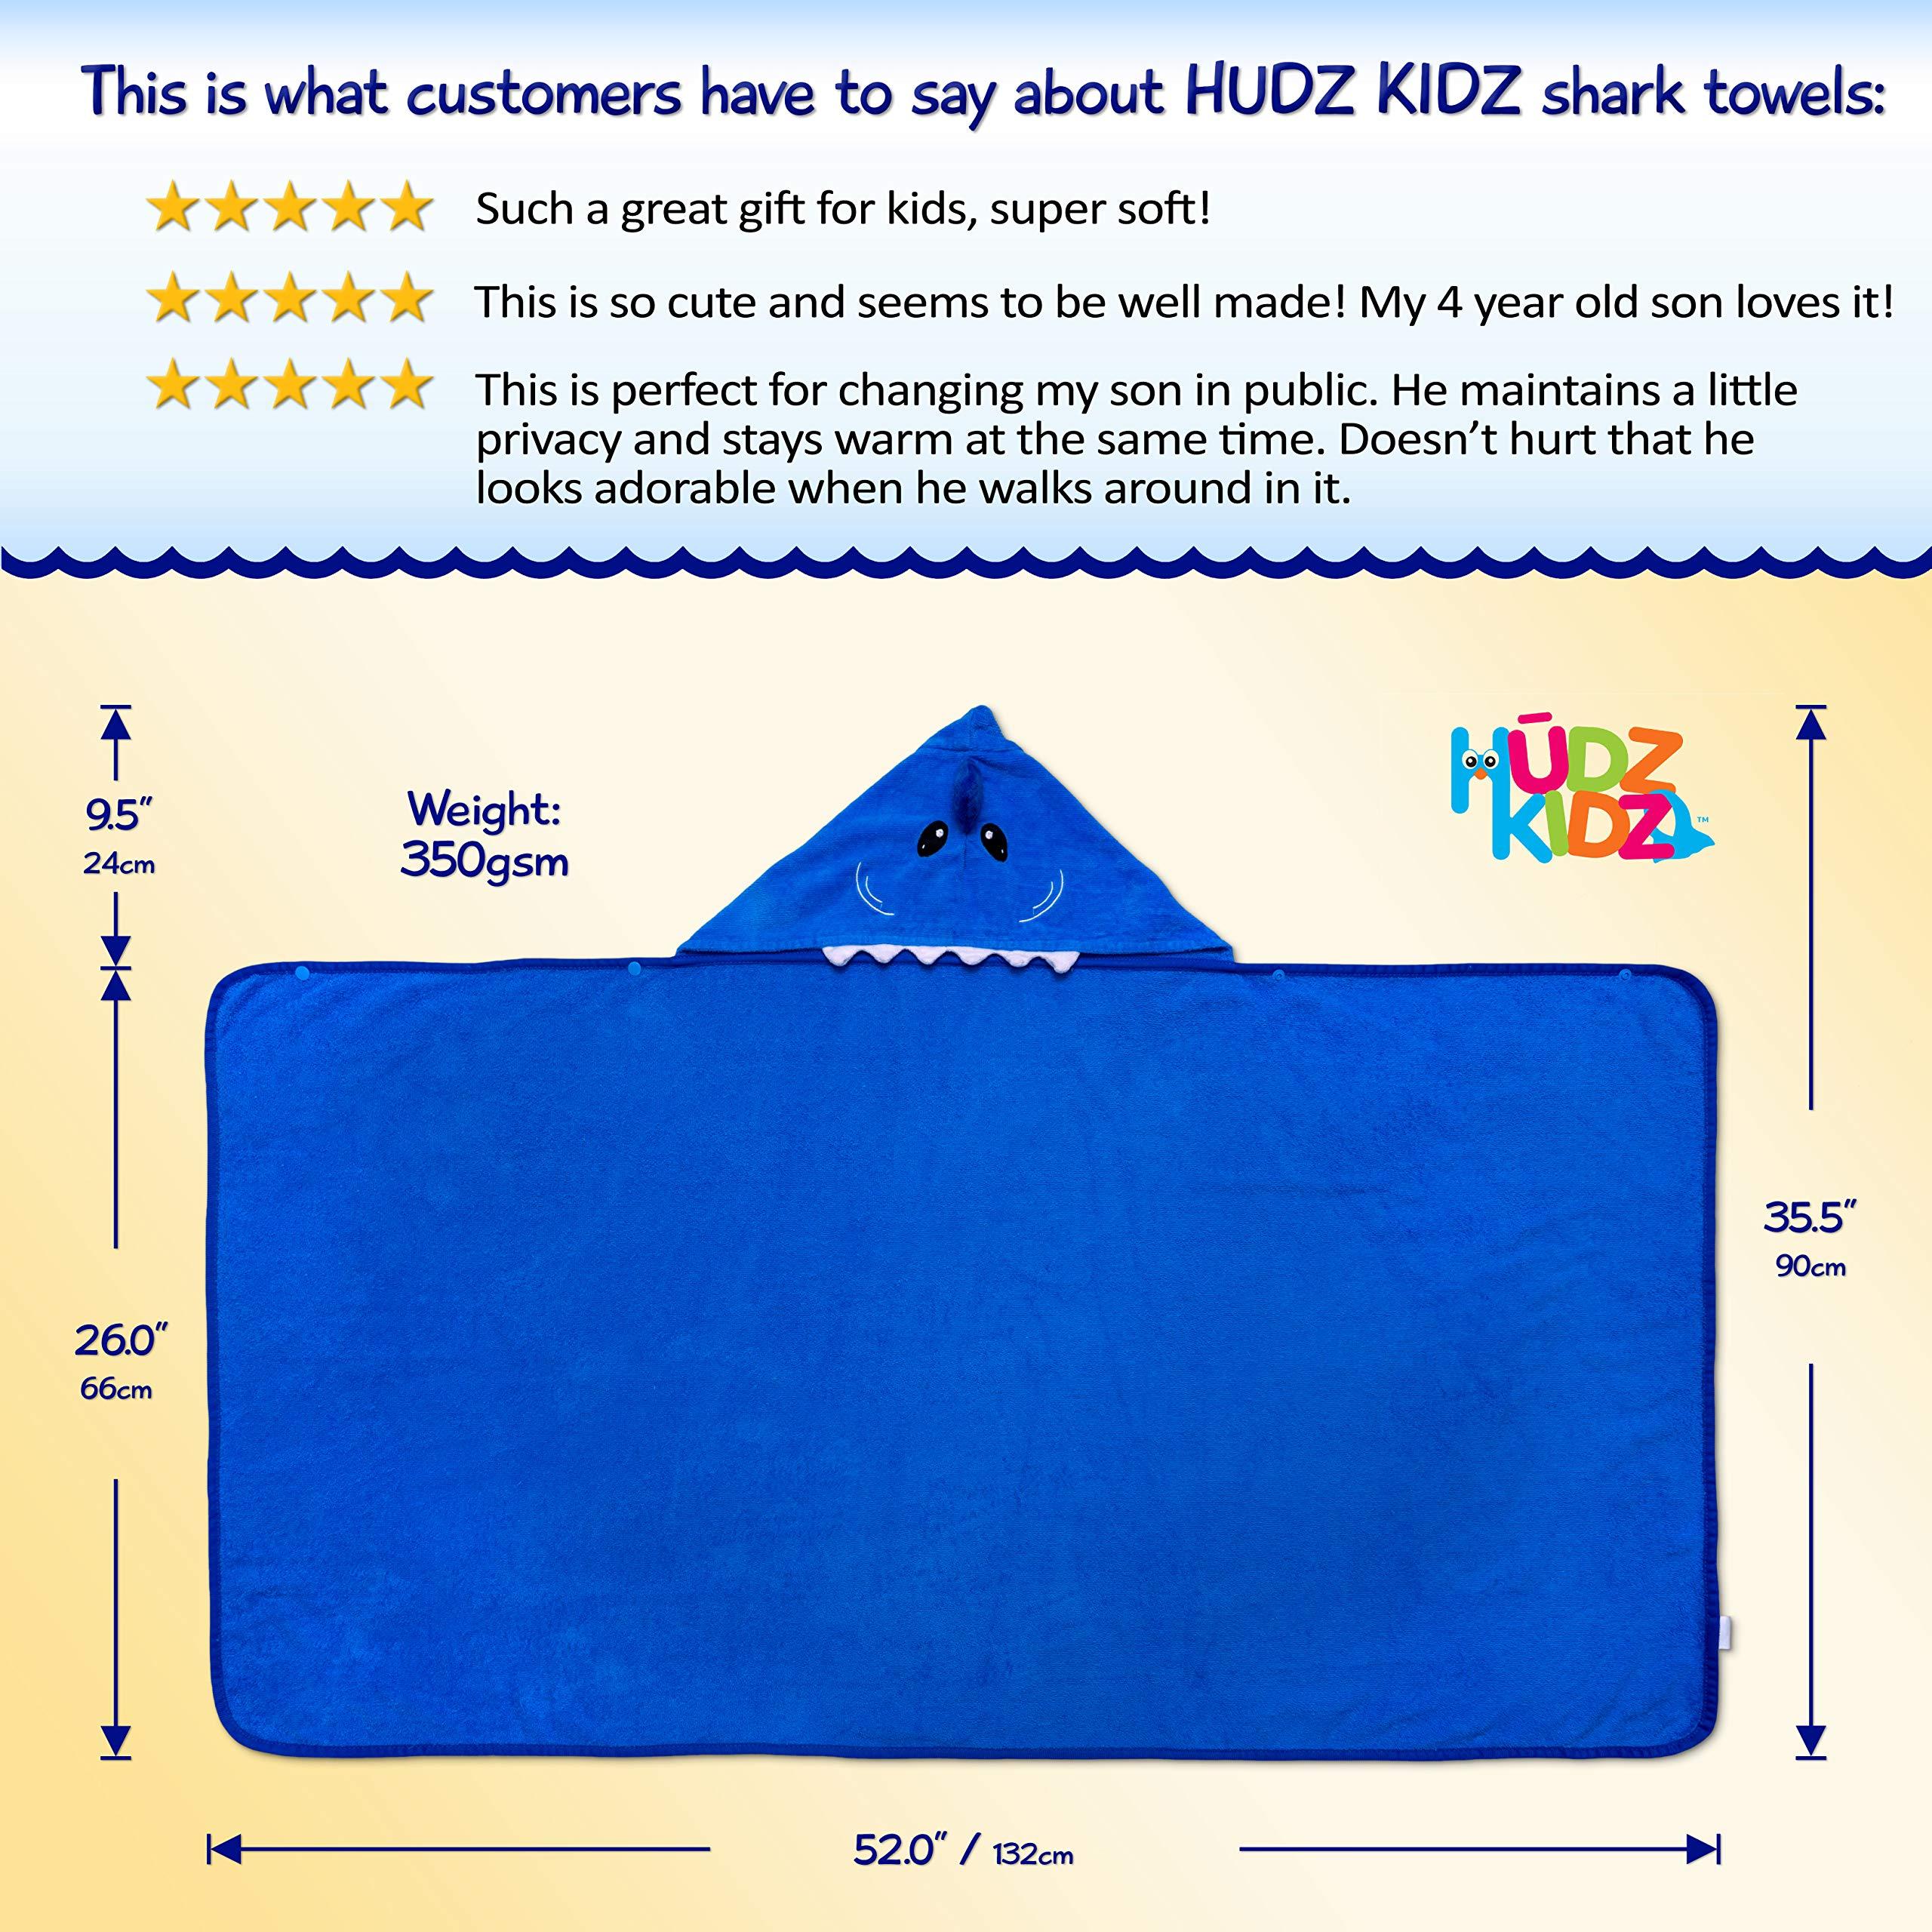 Hudz Kidz Hooded Towel for Kids & Toddlers, Ideal at Bath, Beach, Pool by Hudz Kidz (Image #4)